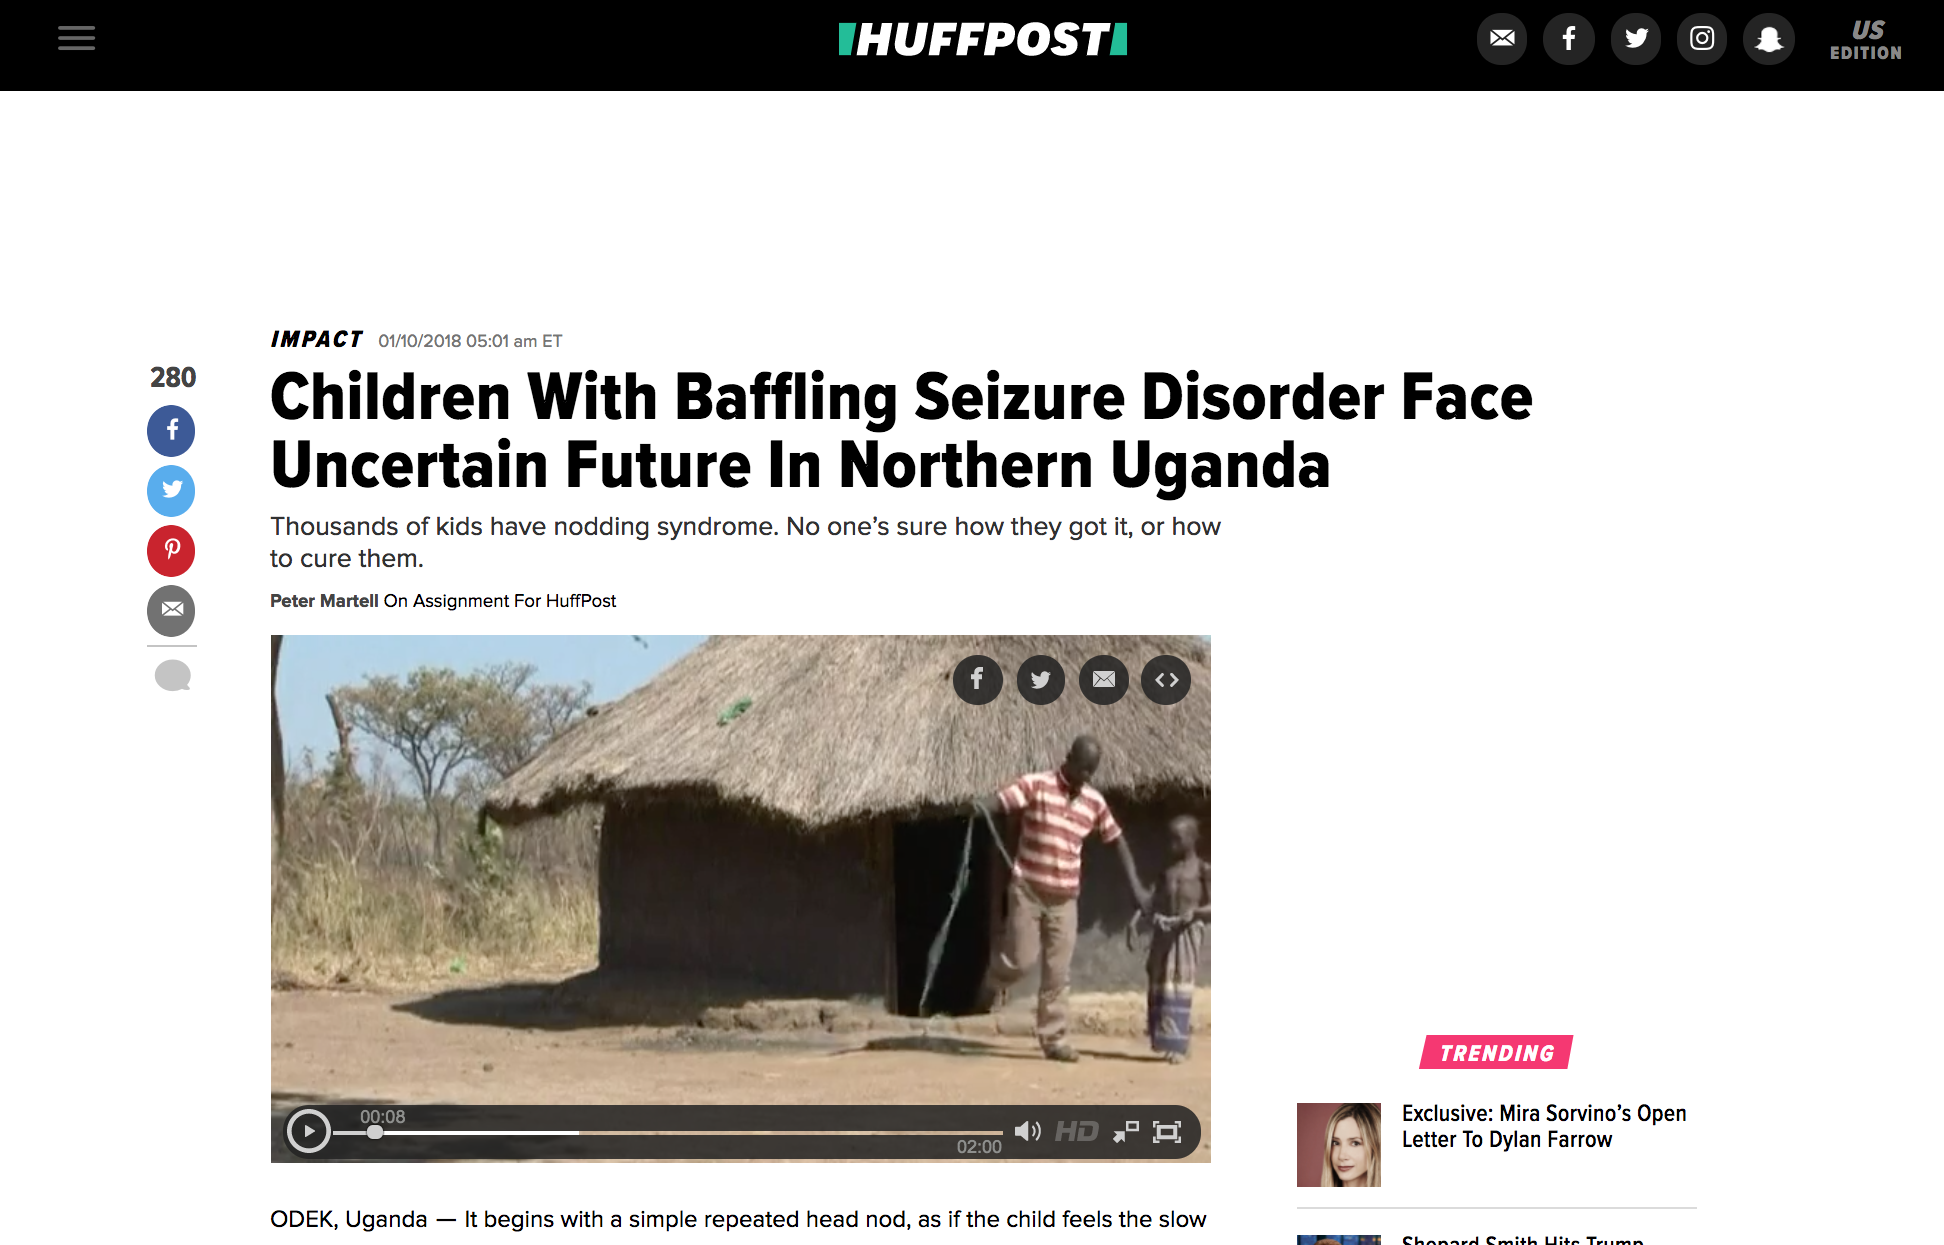 Nodding syndrome in Uganda // Huffington Post 01.2018